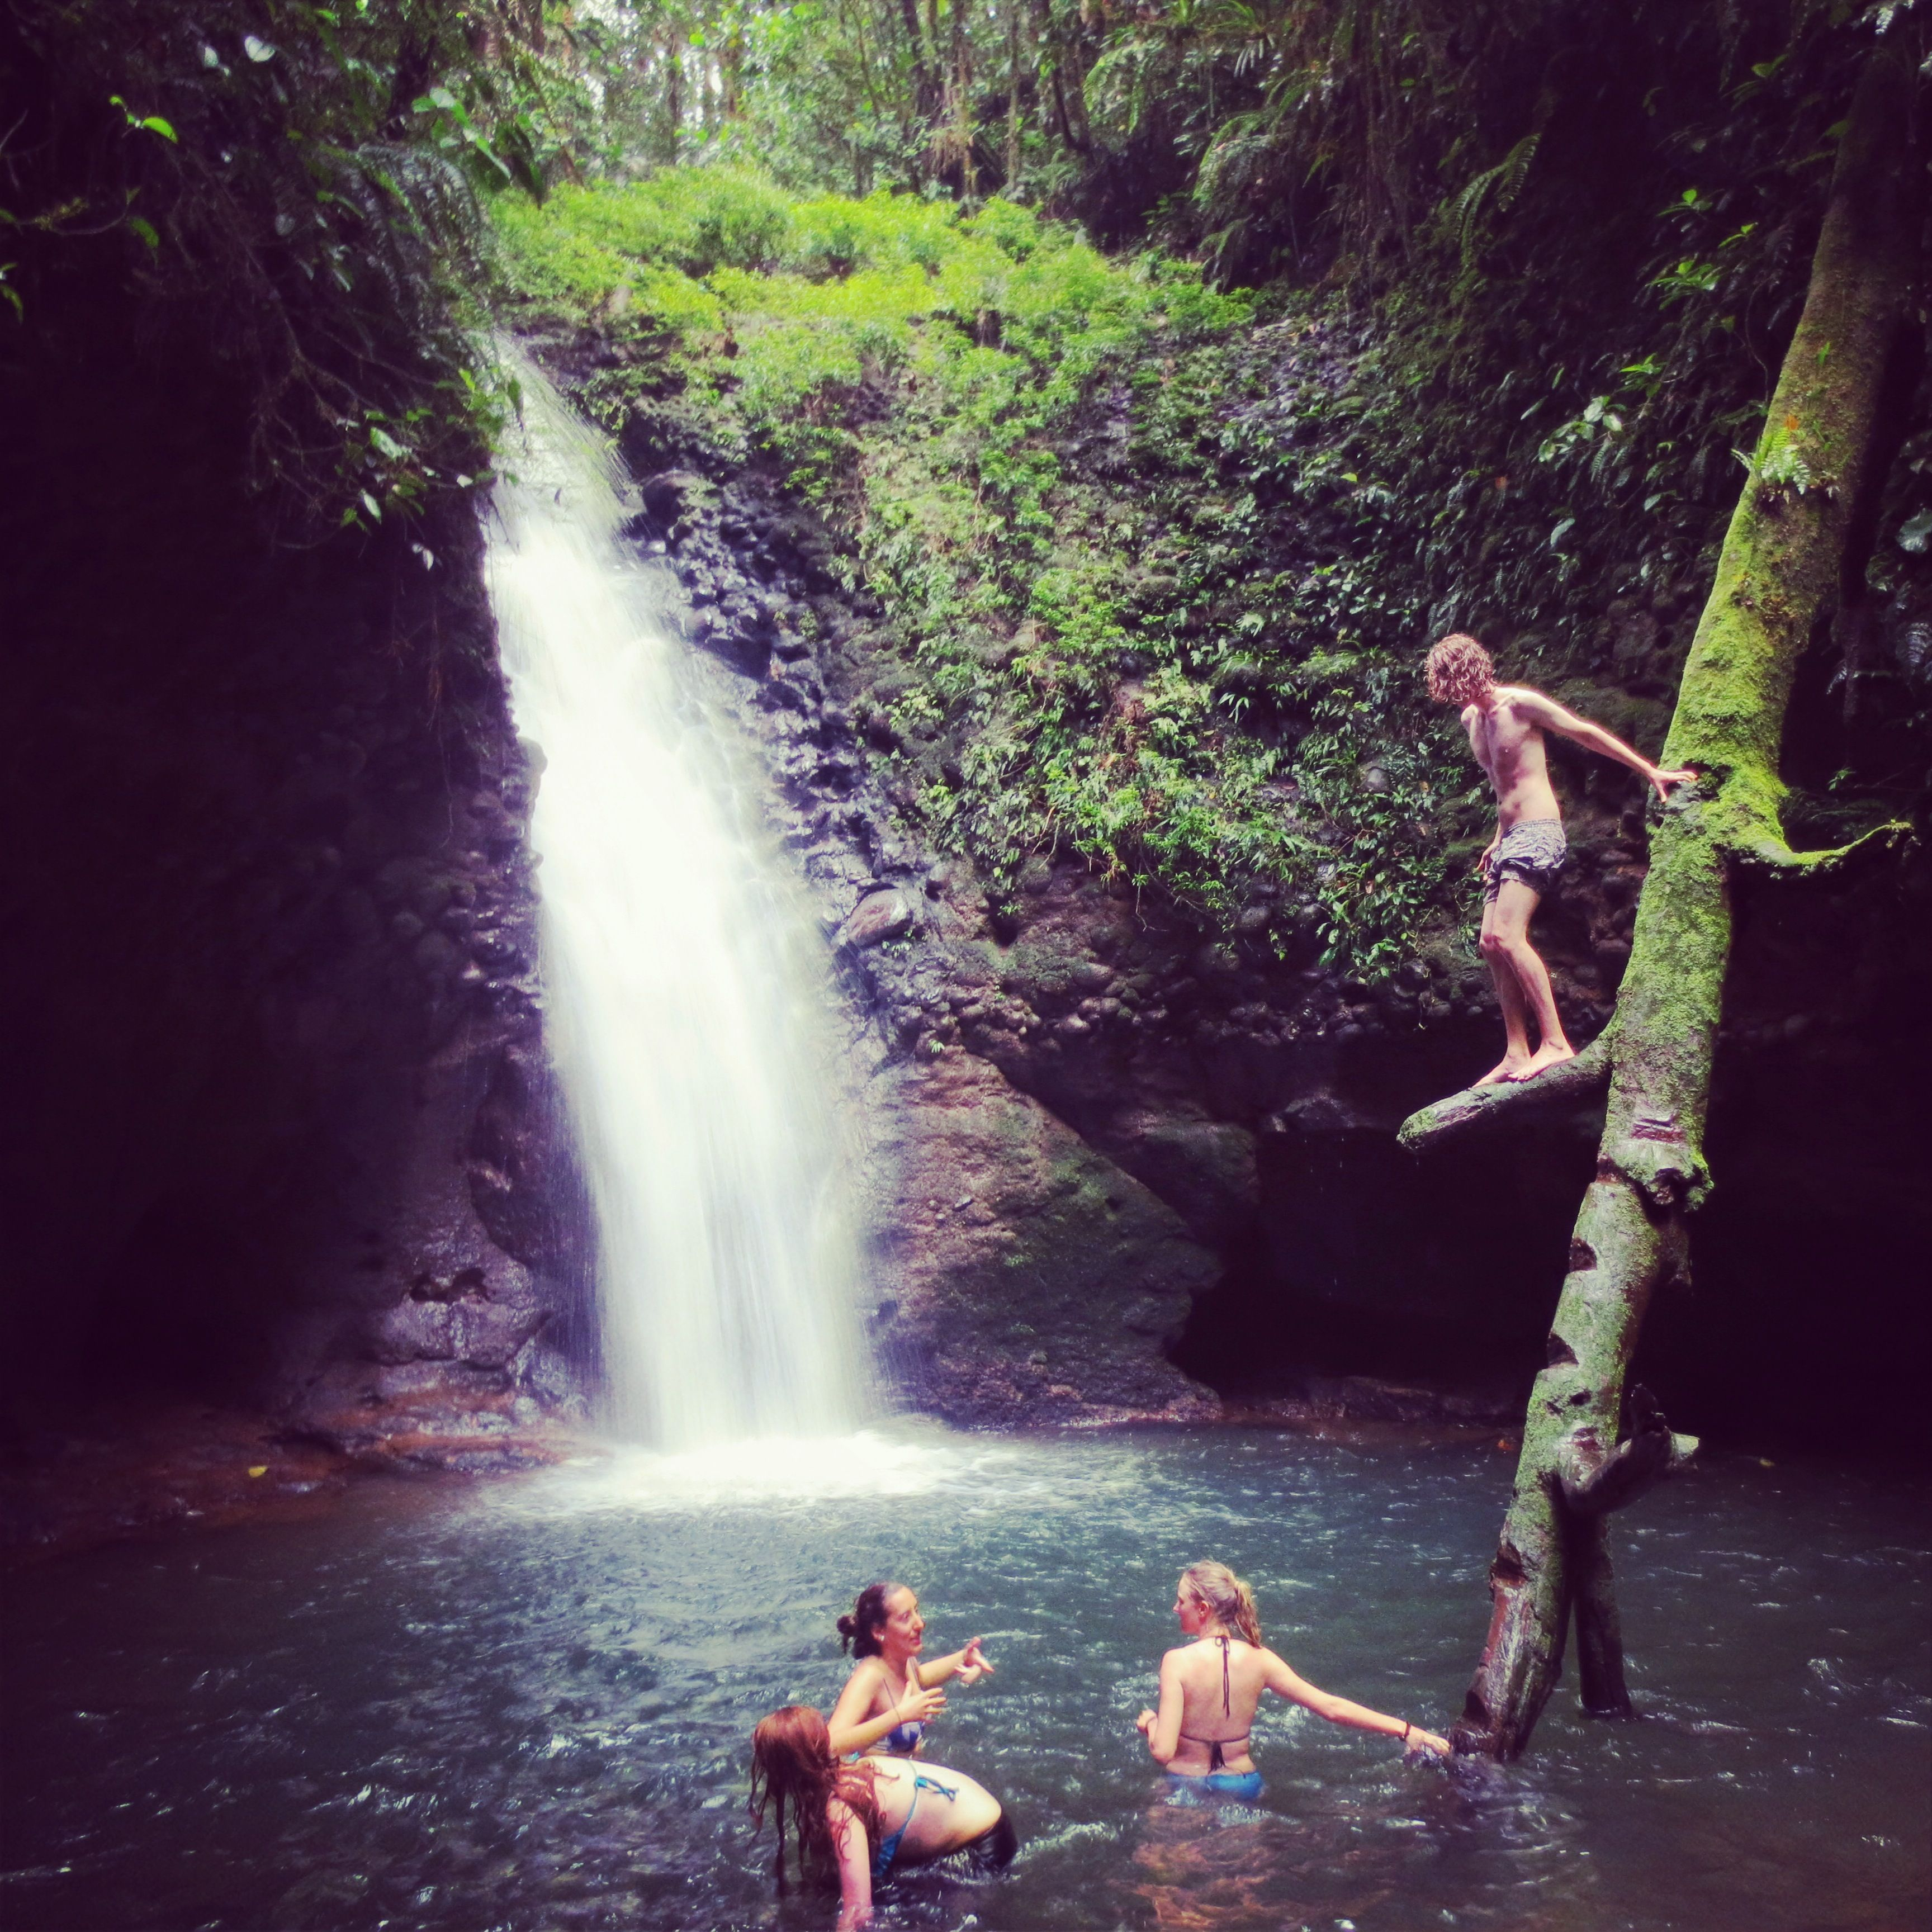 A Waterfall We Stumbled Across In The Amazon Rainforest, Ecuador,